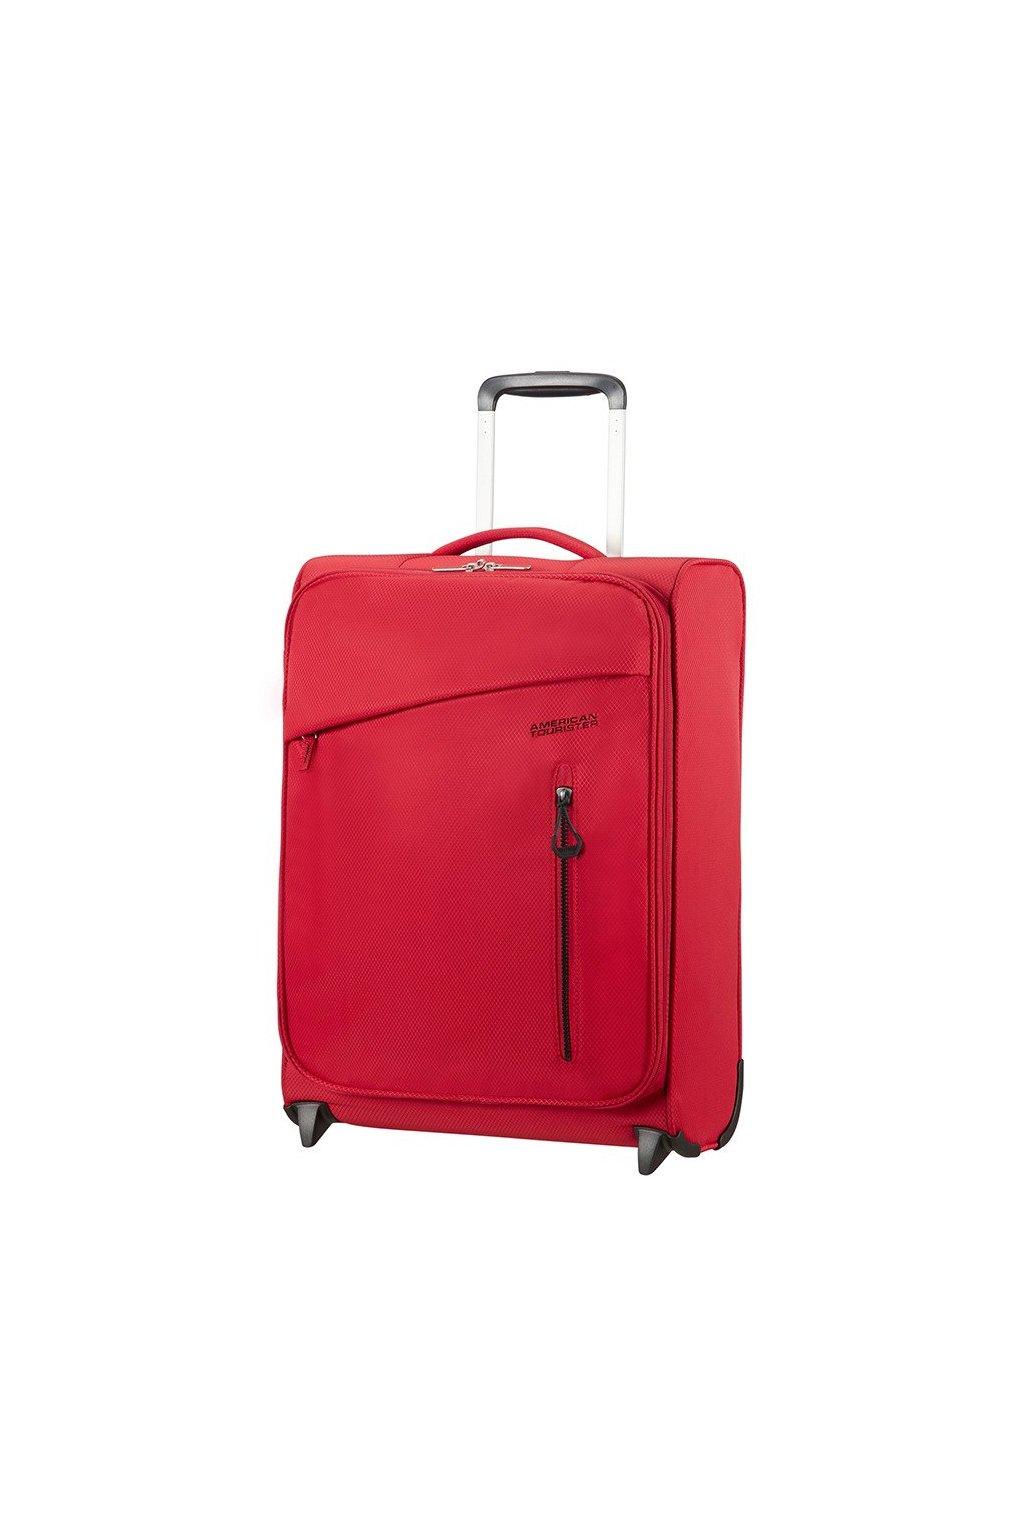 kufrland americantourister litewing red 55 upright (1)